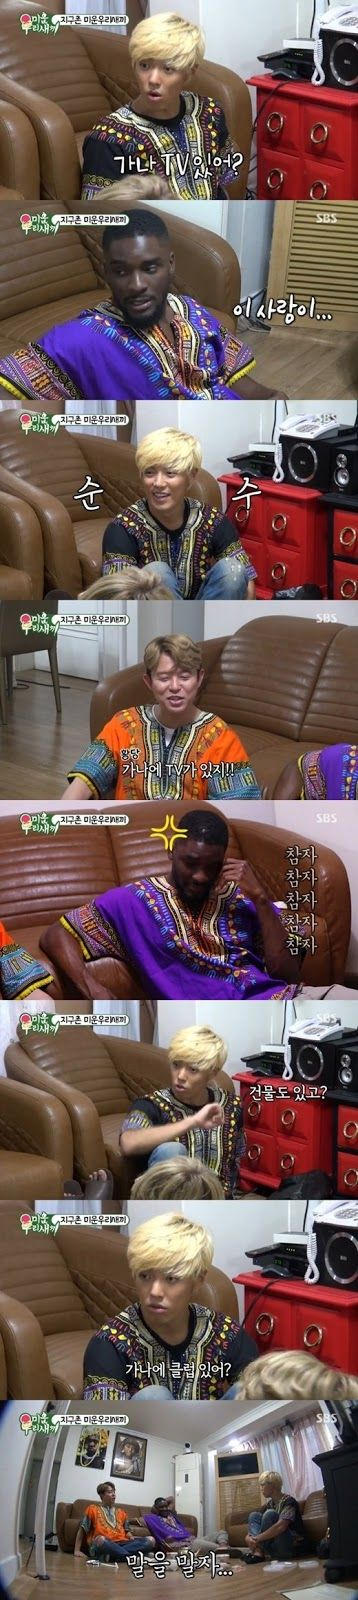 [TALKBIT] Gangnam asks Sam Okyere rude questions : KPOP News Gangnam M.I.B.